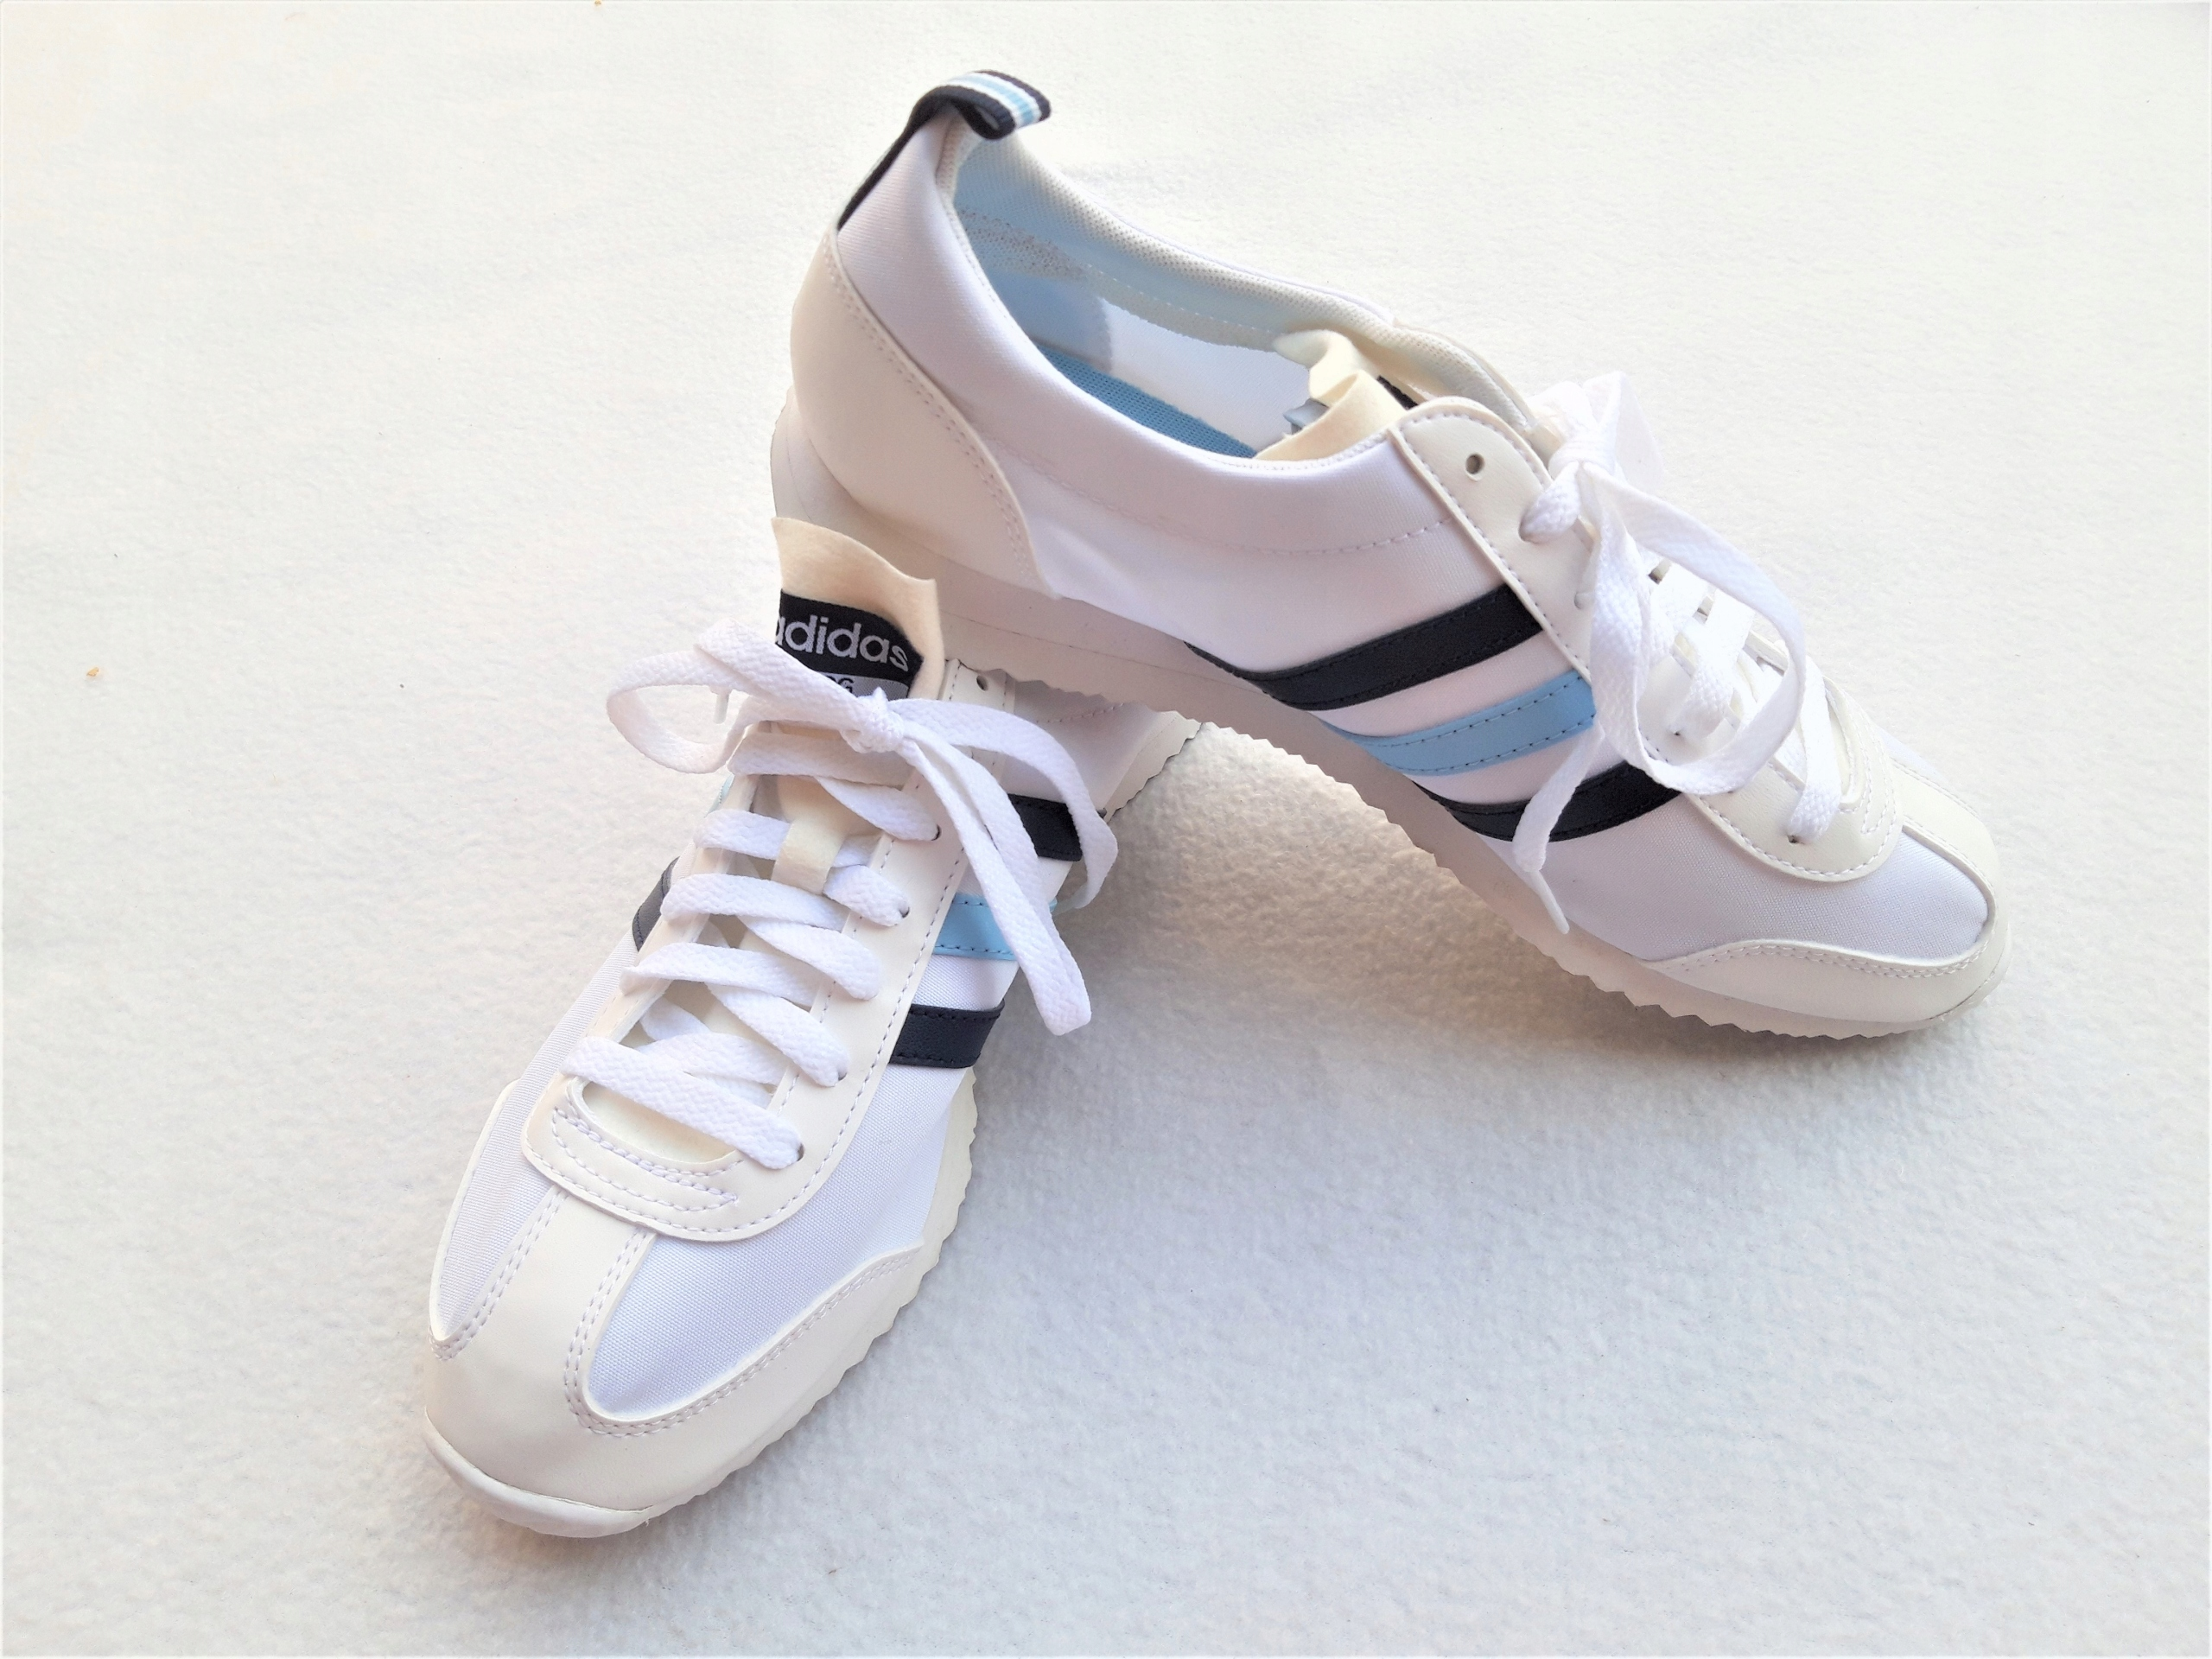 ADIDAS NEO COMFORT FOOTBED buty sportowe r 41 lato